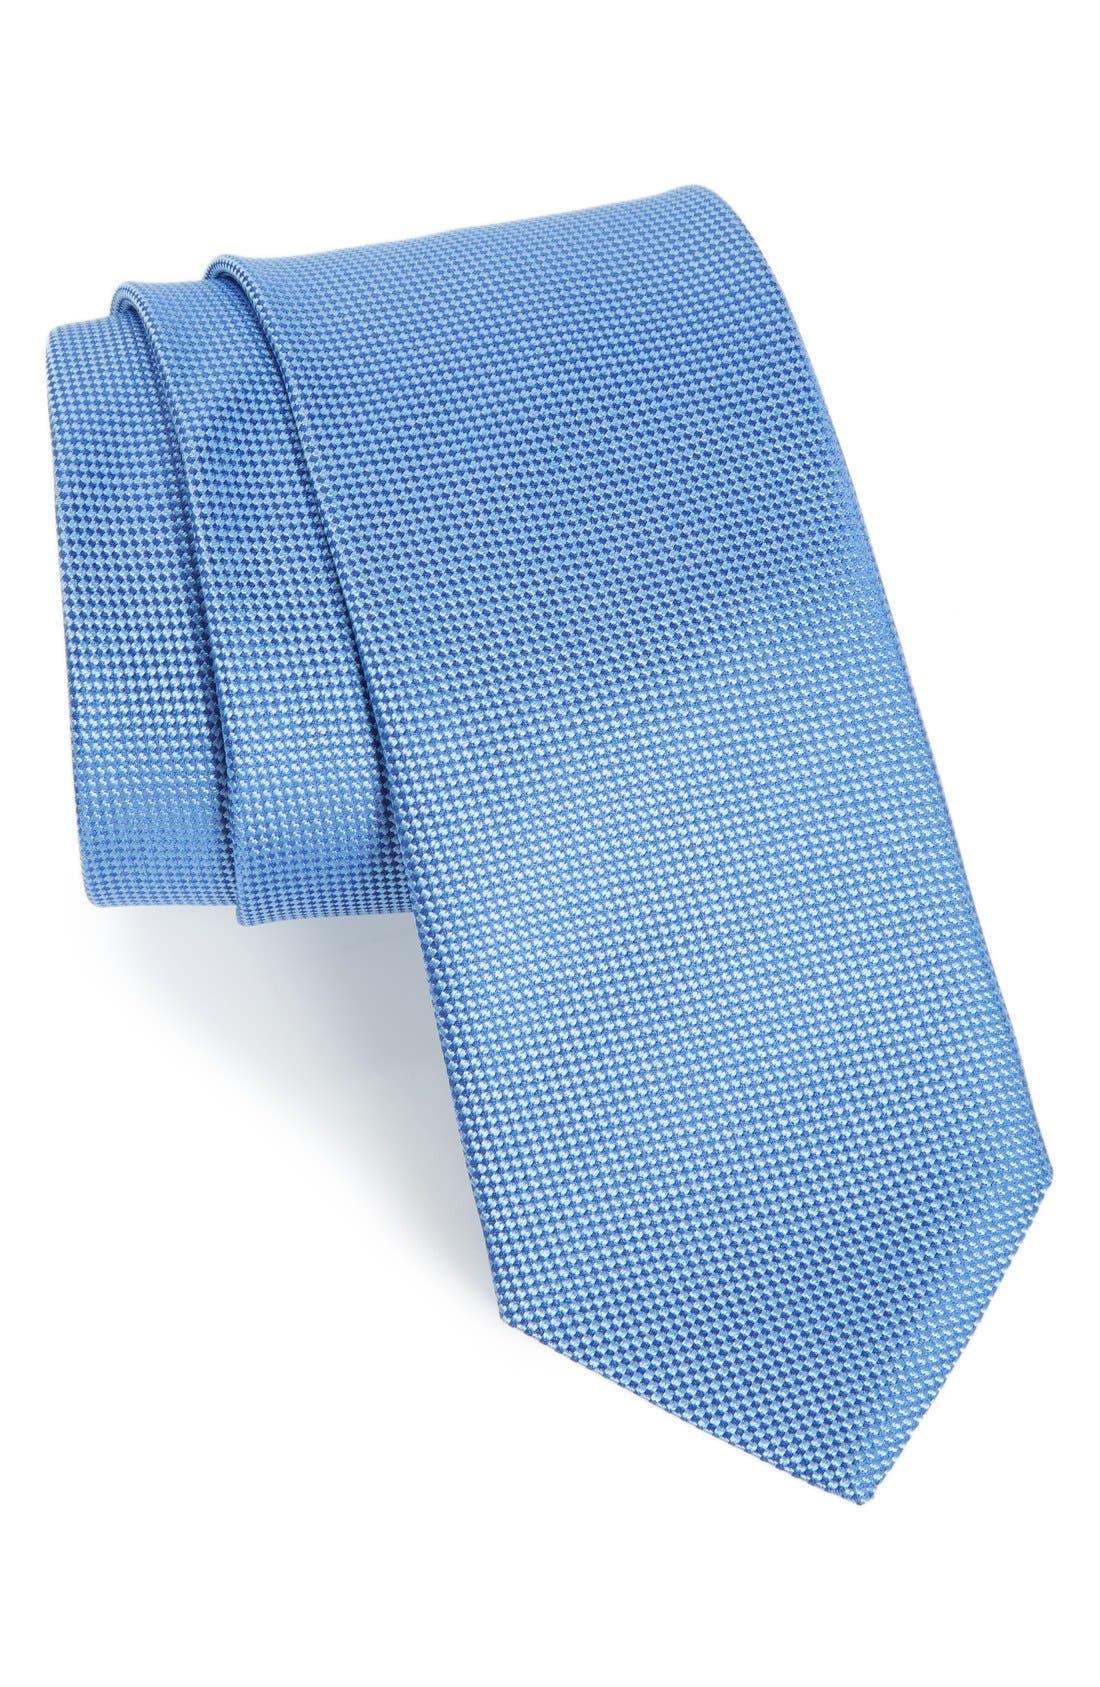 Alternate Image 1 Selected - John W. Nordstrom® 'Ryder' Silk Tie